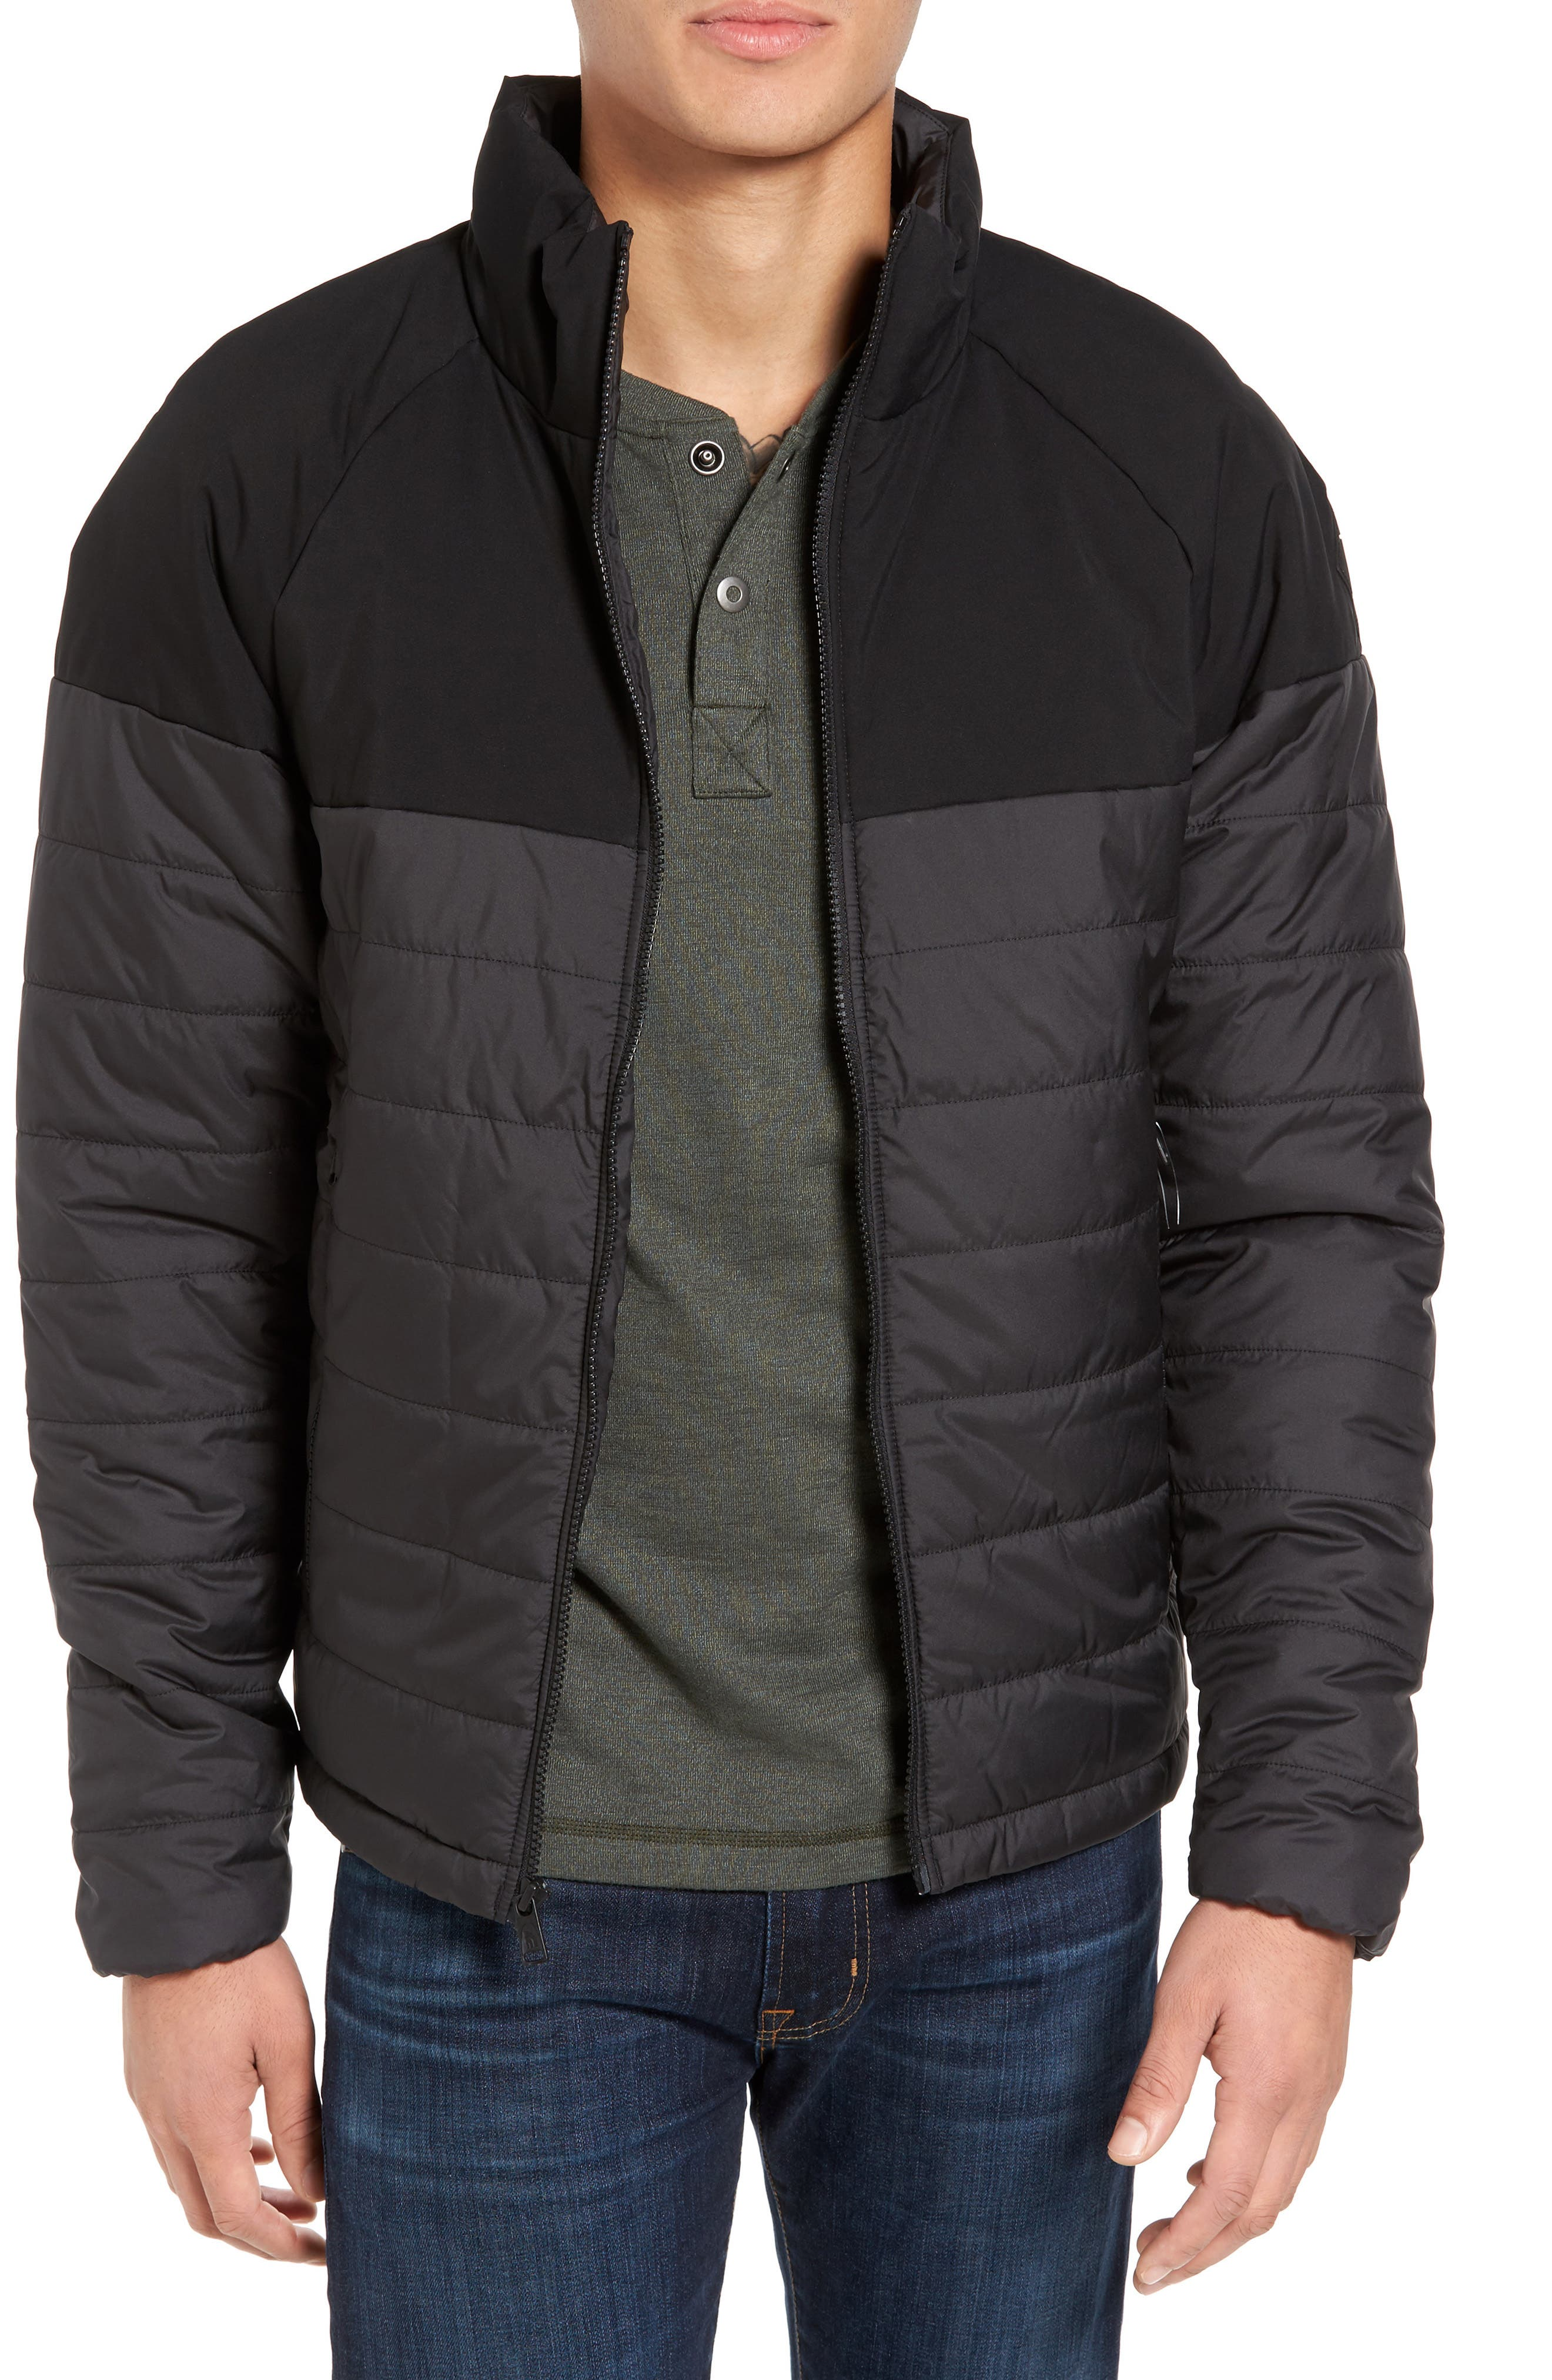 Main Image - The North Face Skokie Jacket